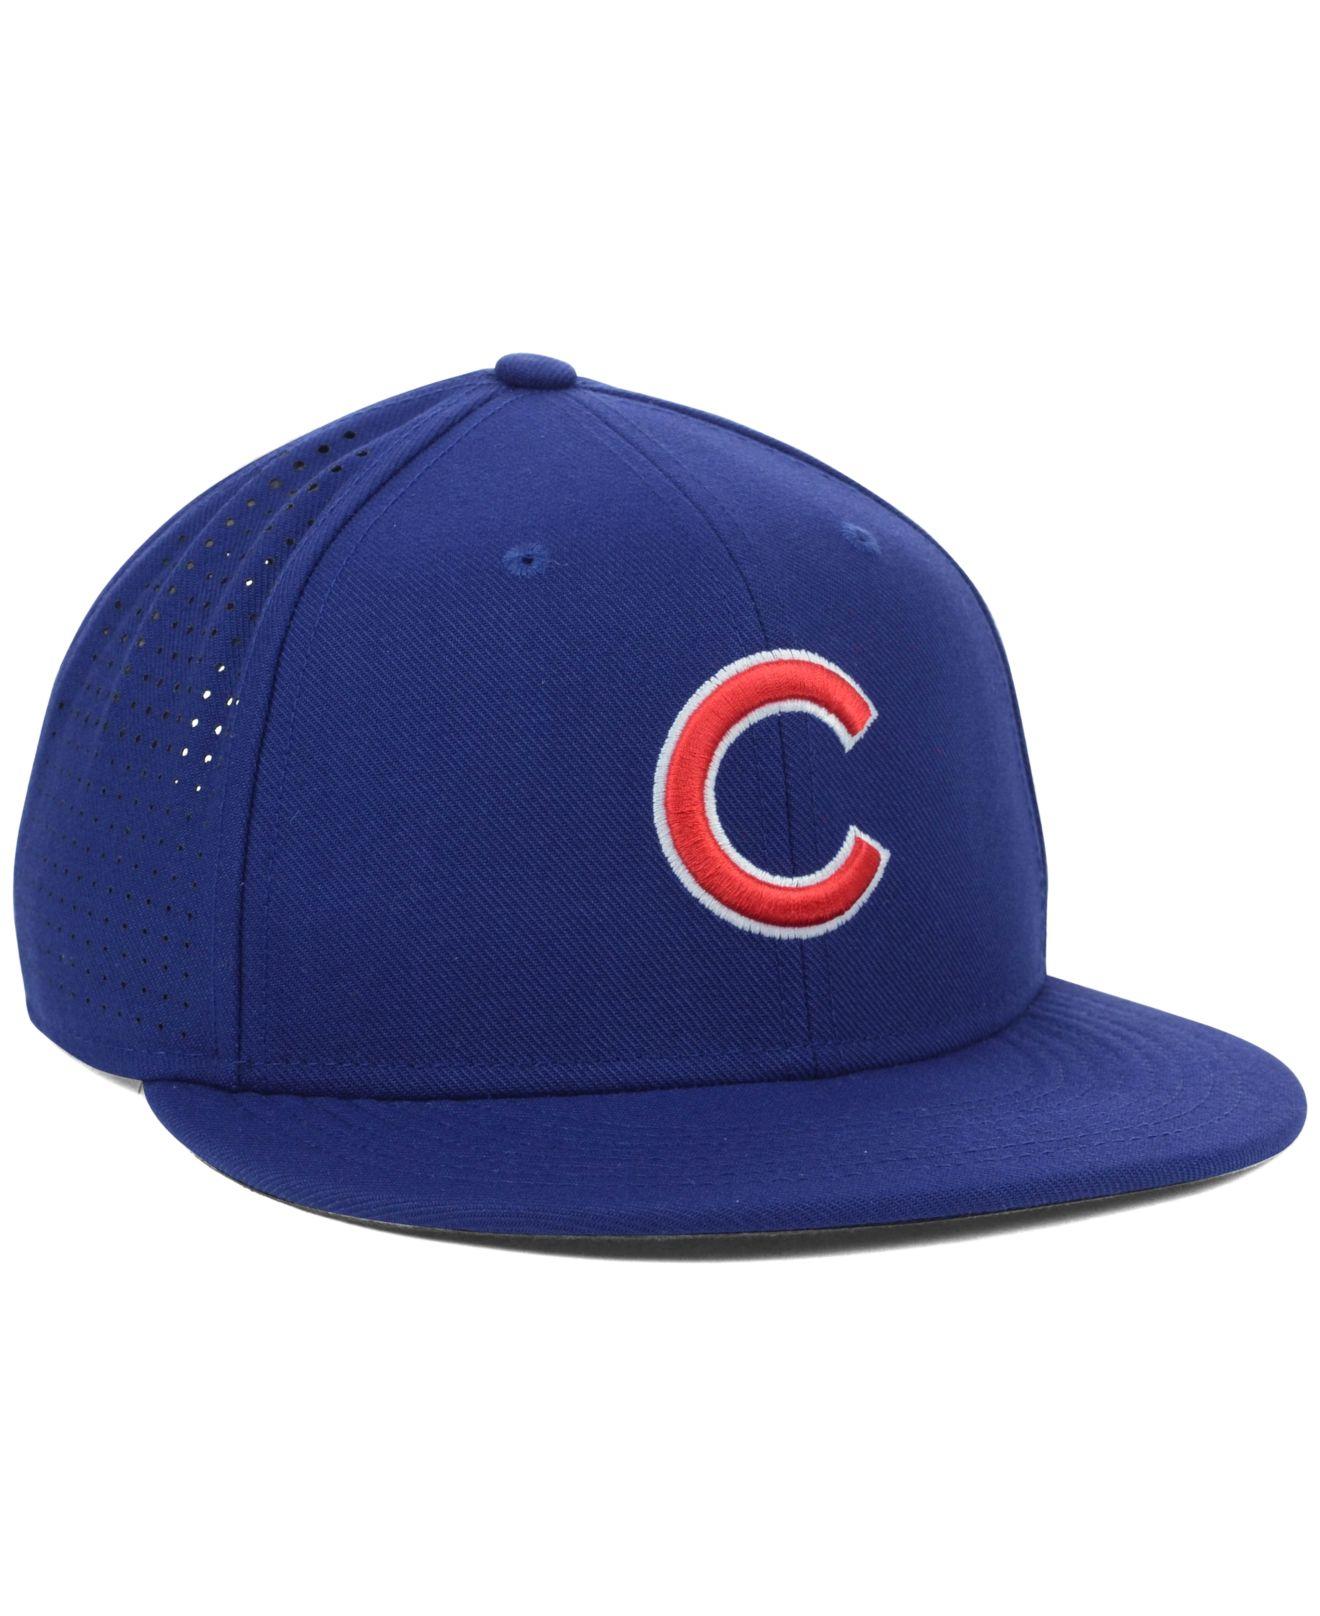 3dd4845199c ... coupon for lyst nike chicago cubs dri fit vapor adjustable cap in blue  for men 4f6ef